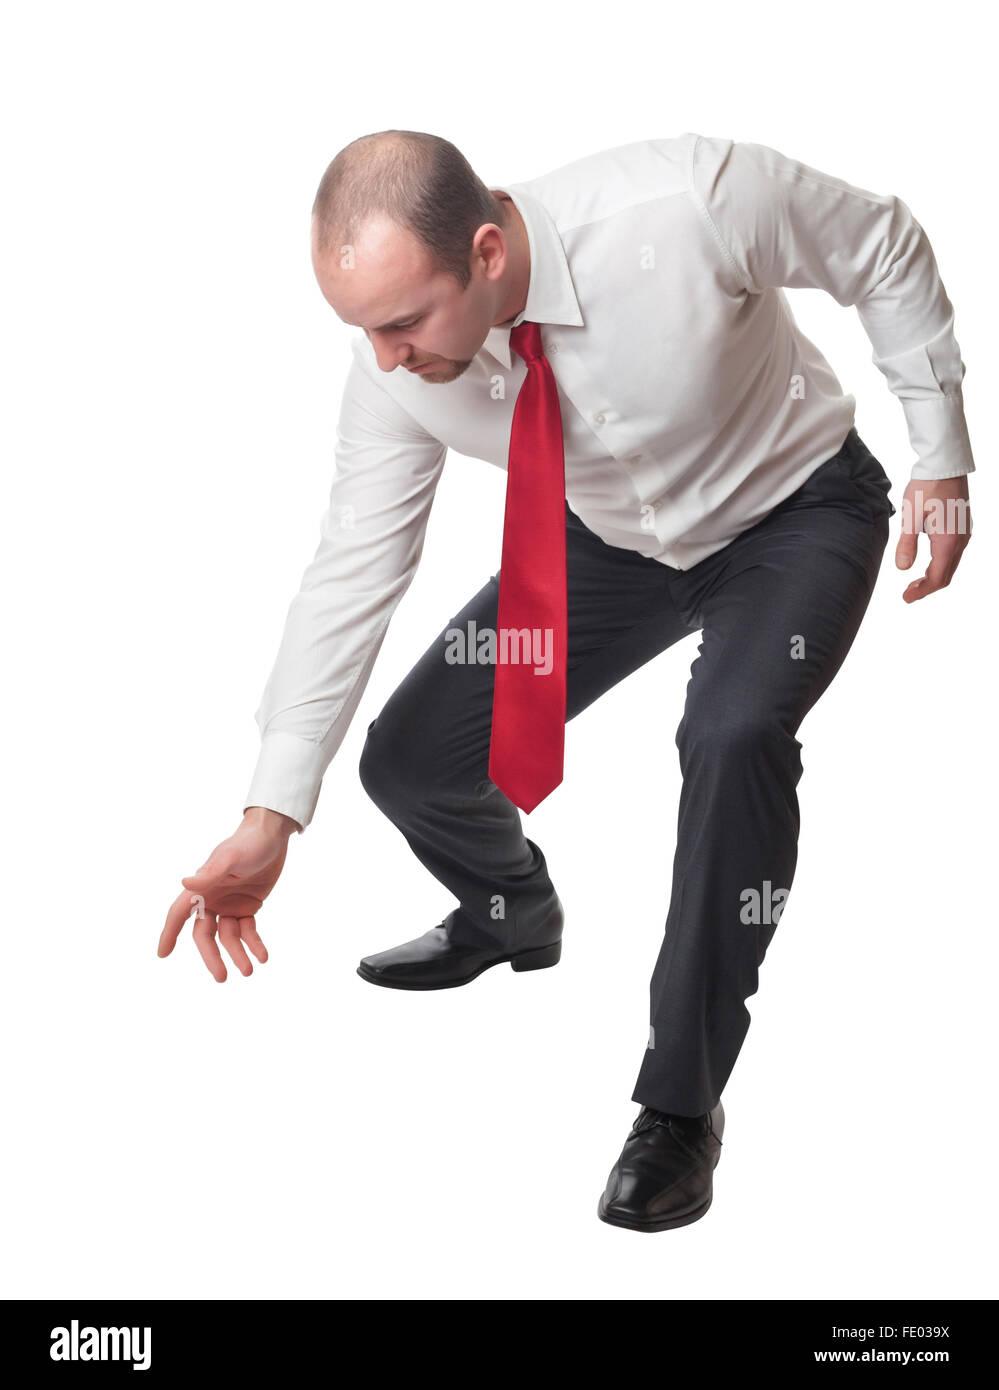 lowered man portrait isolated on white background - Stock Image